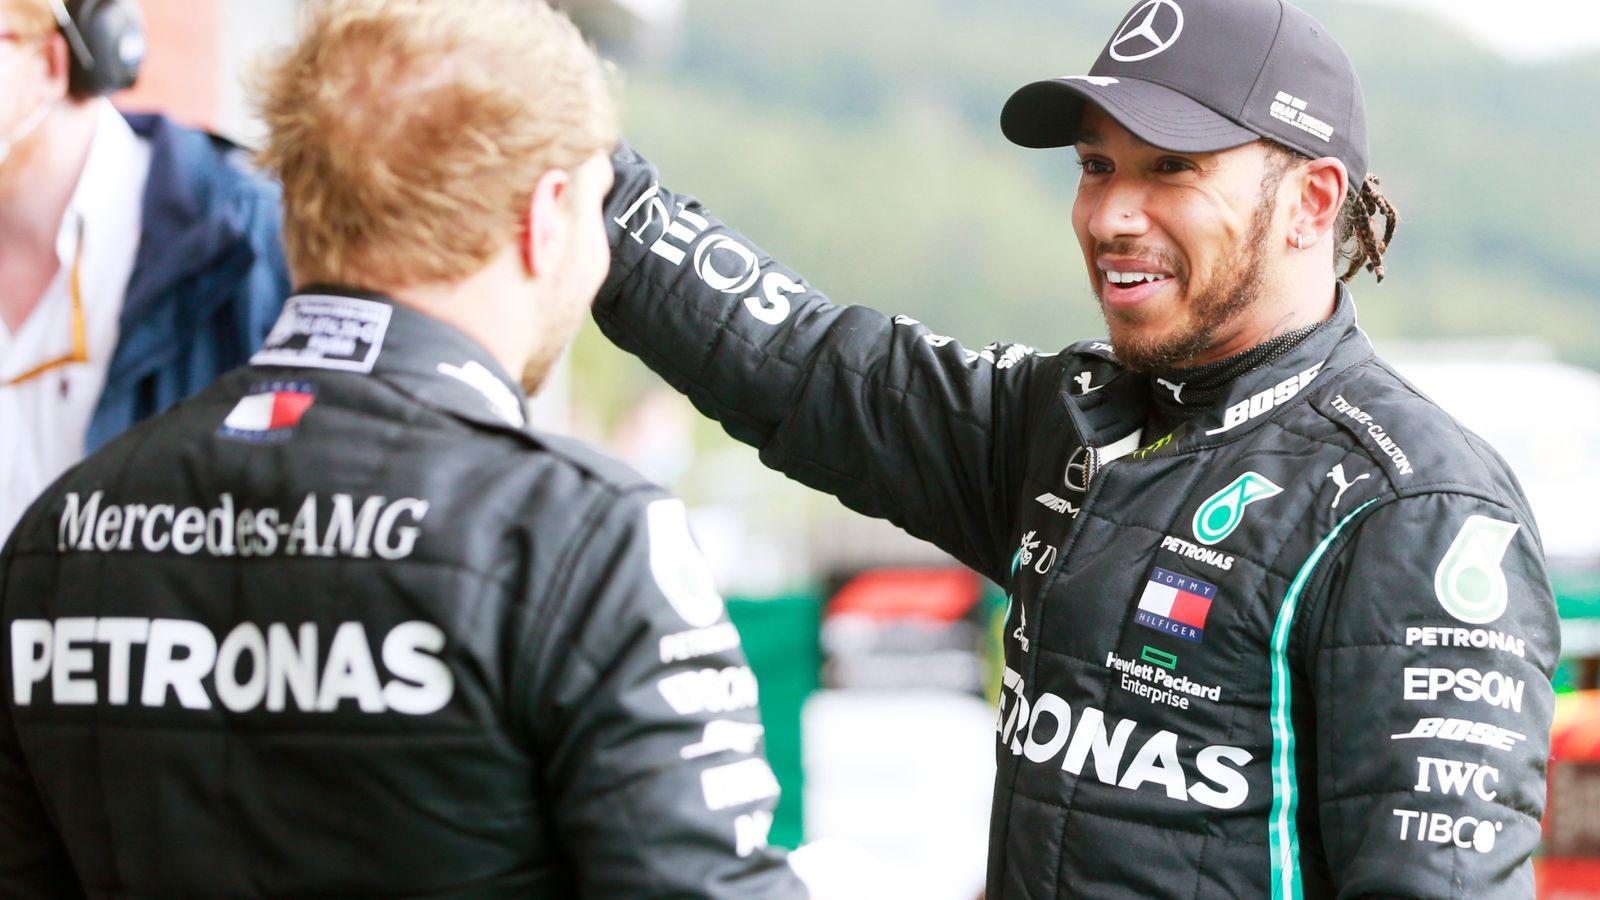 Belgian GP: Lewis Hamilton wins to stretch title lead, Ferrari out of points